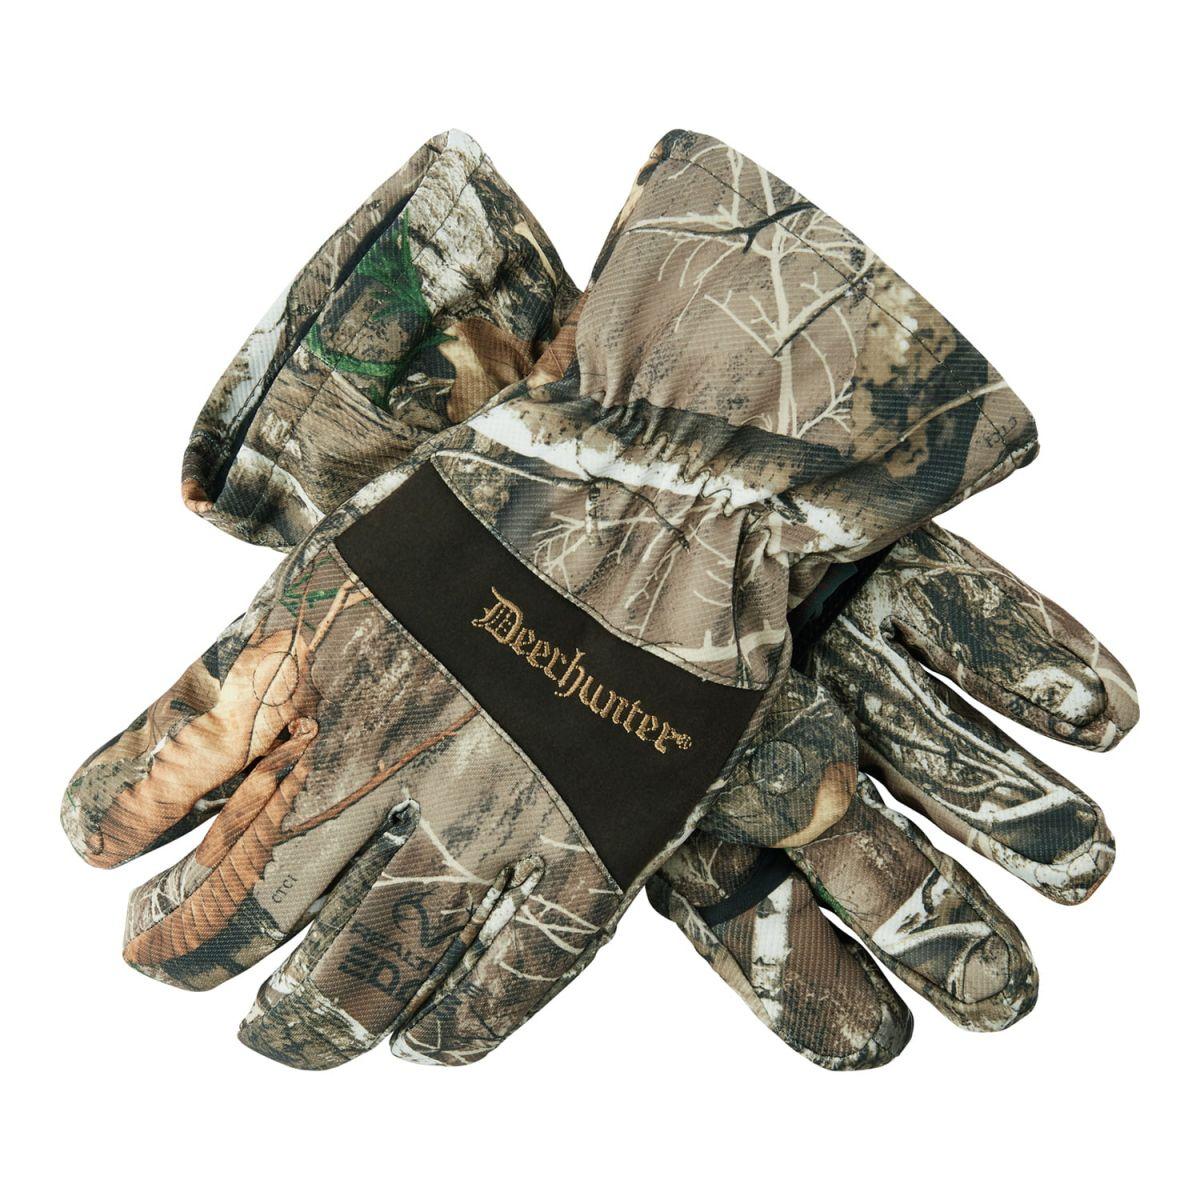 Перчатки Deerhunter Muflon Winter Edge